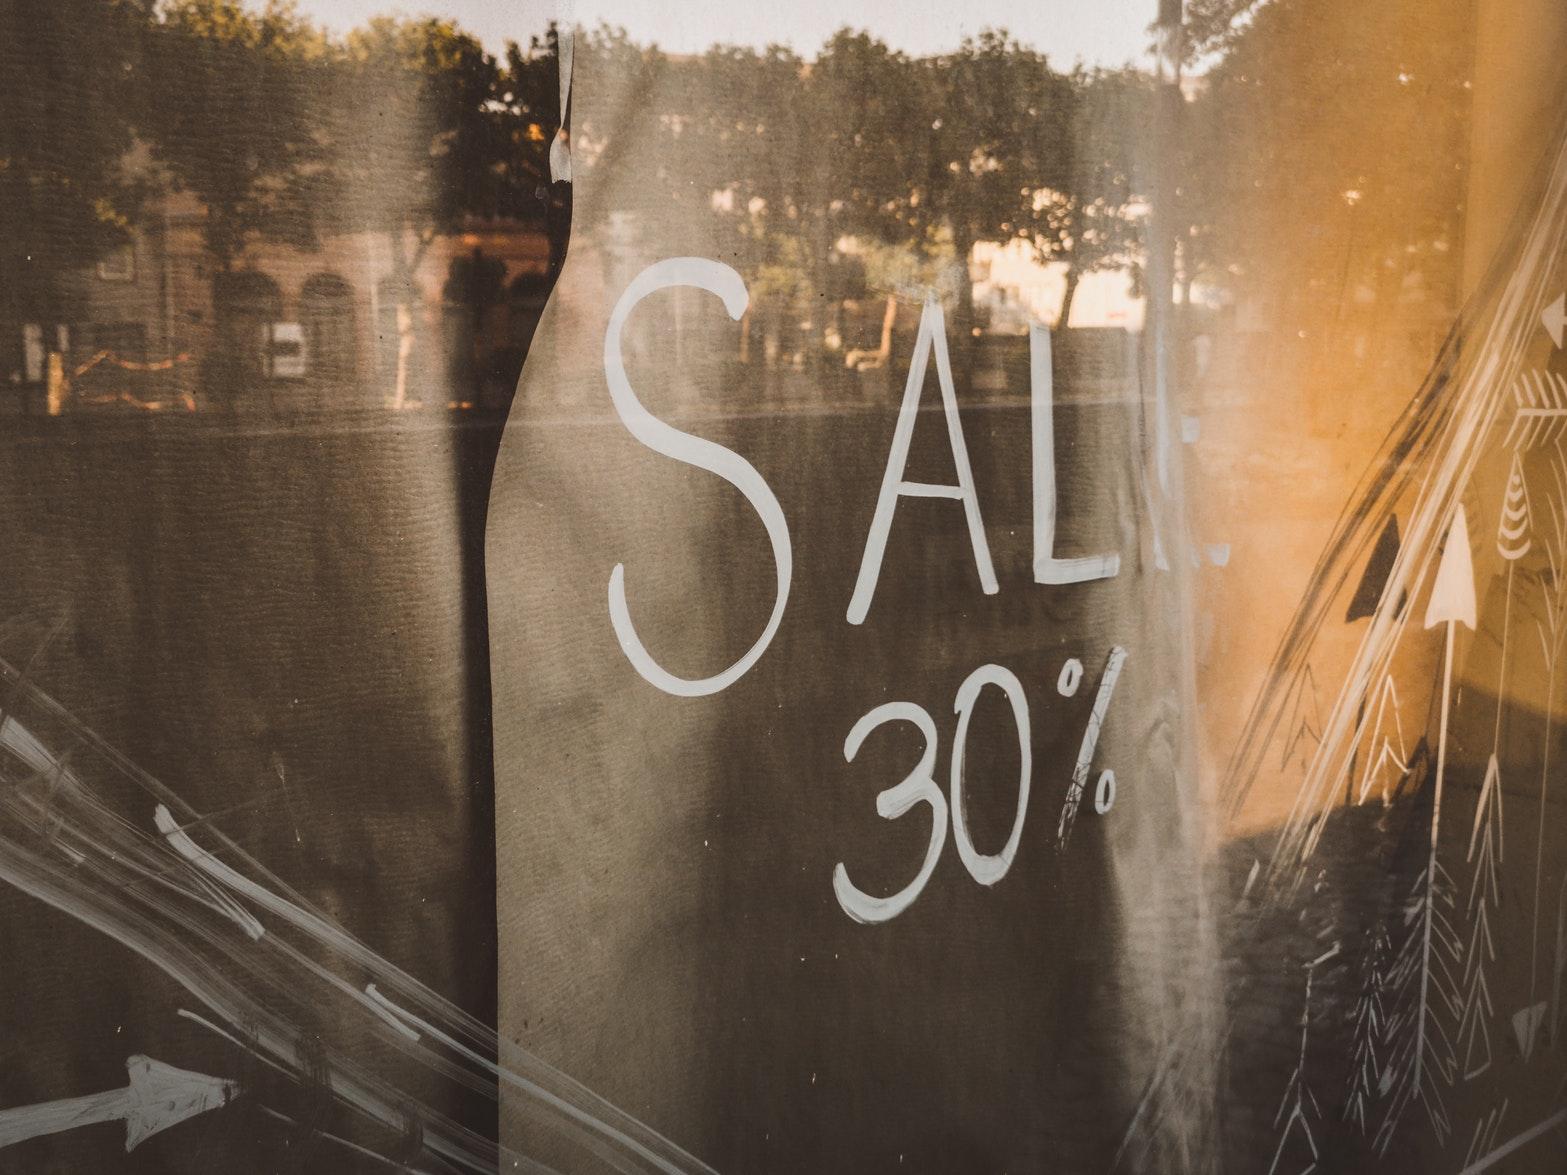 Center Optimization Can Improve Sales_7